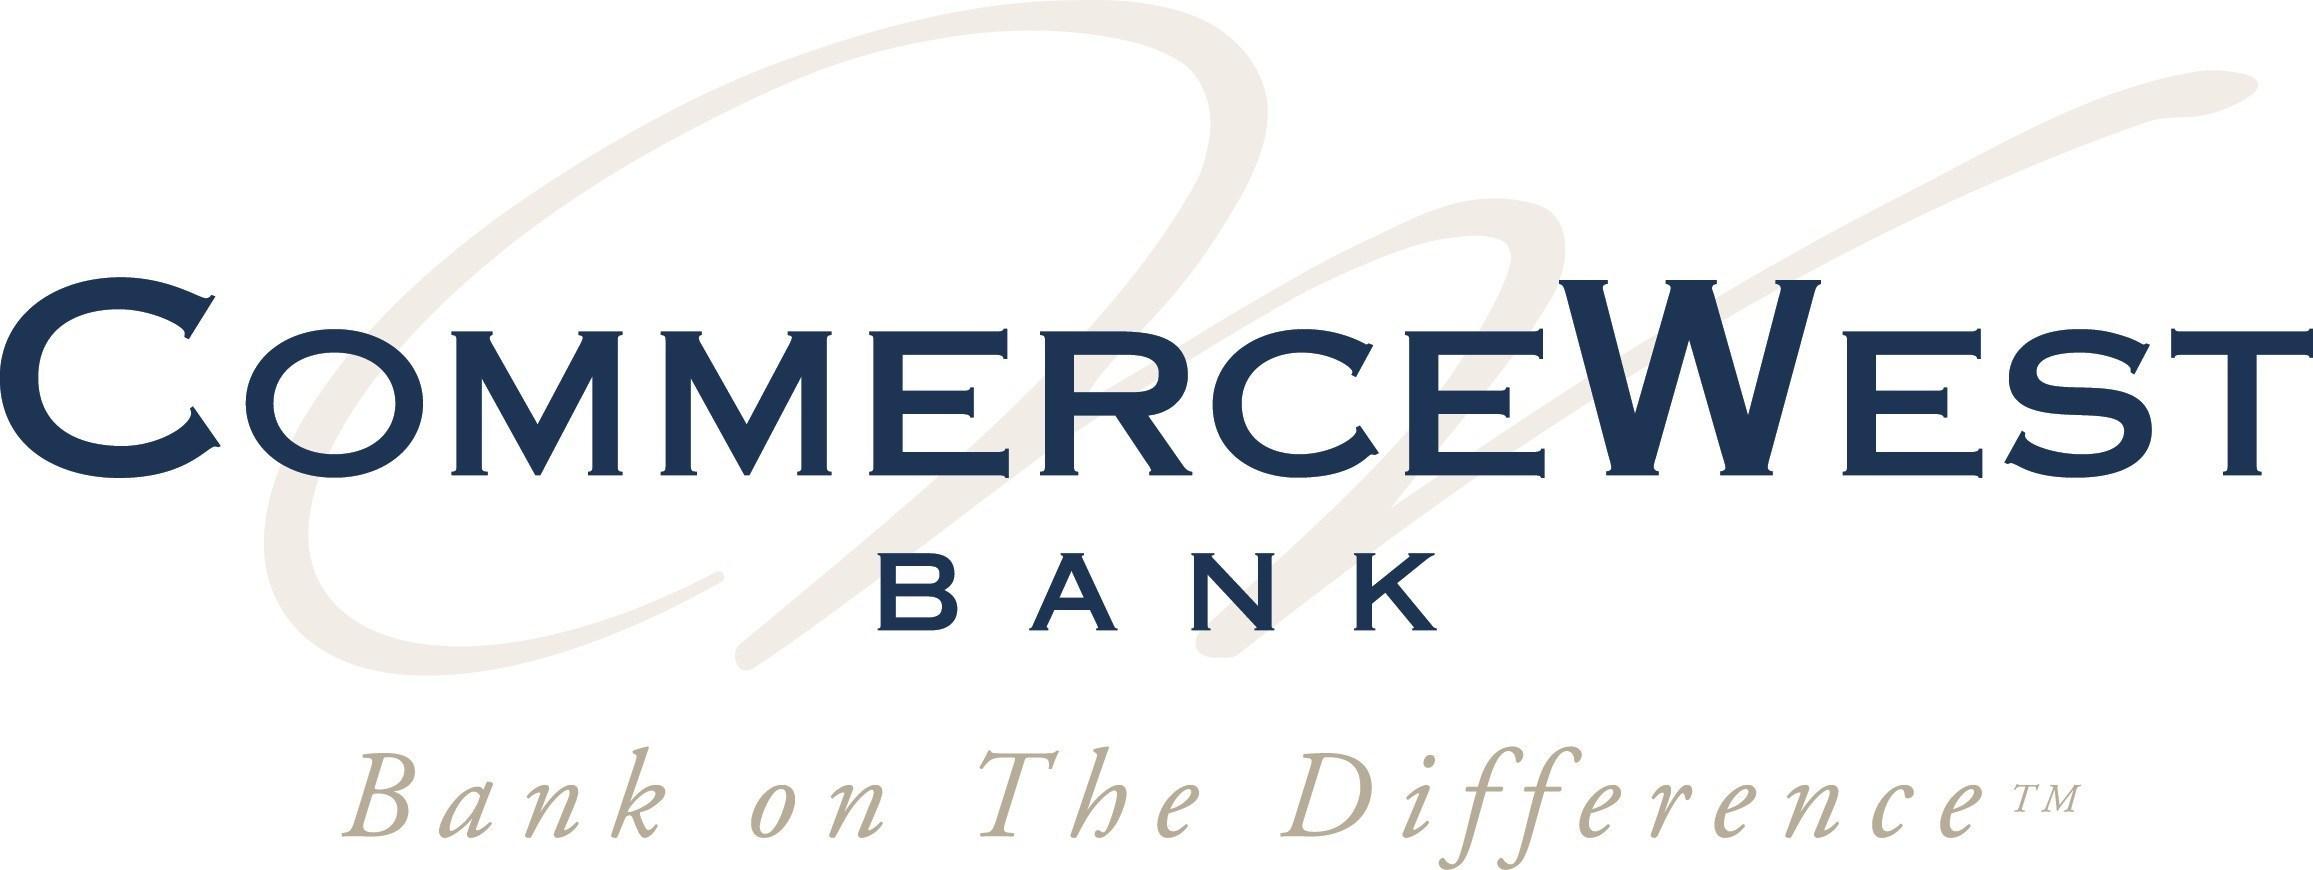 Commercewest Bank Com logo